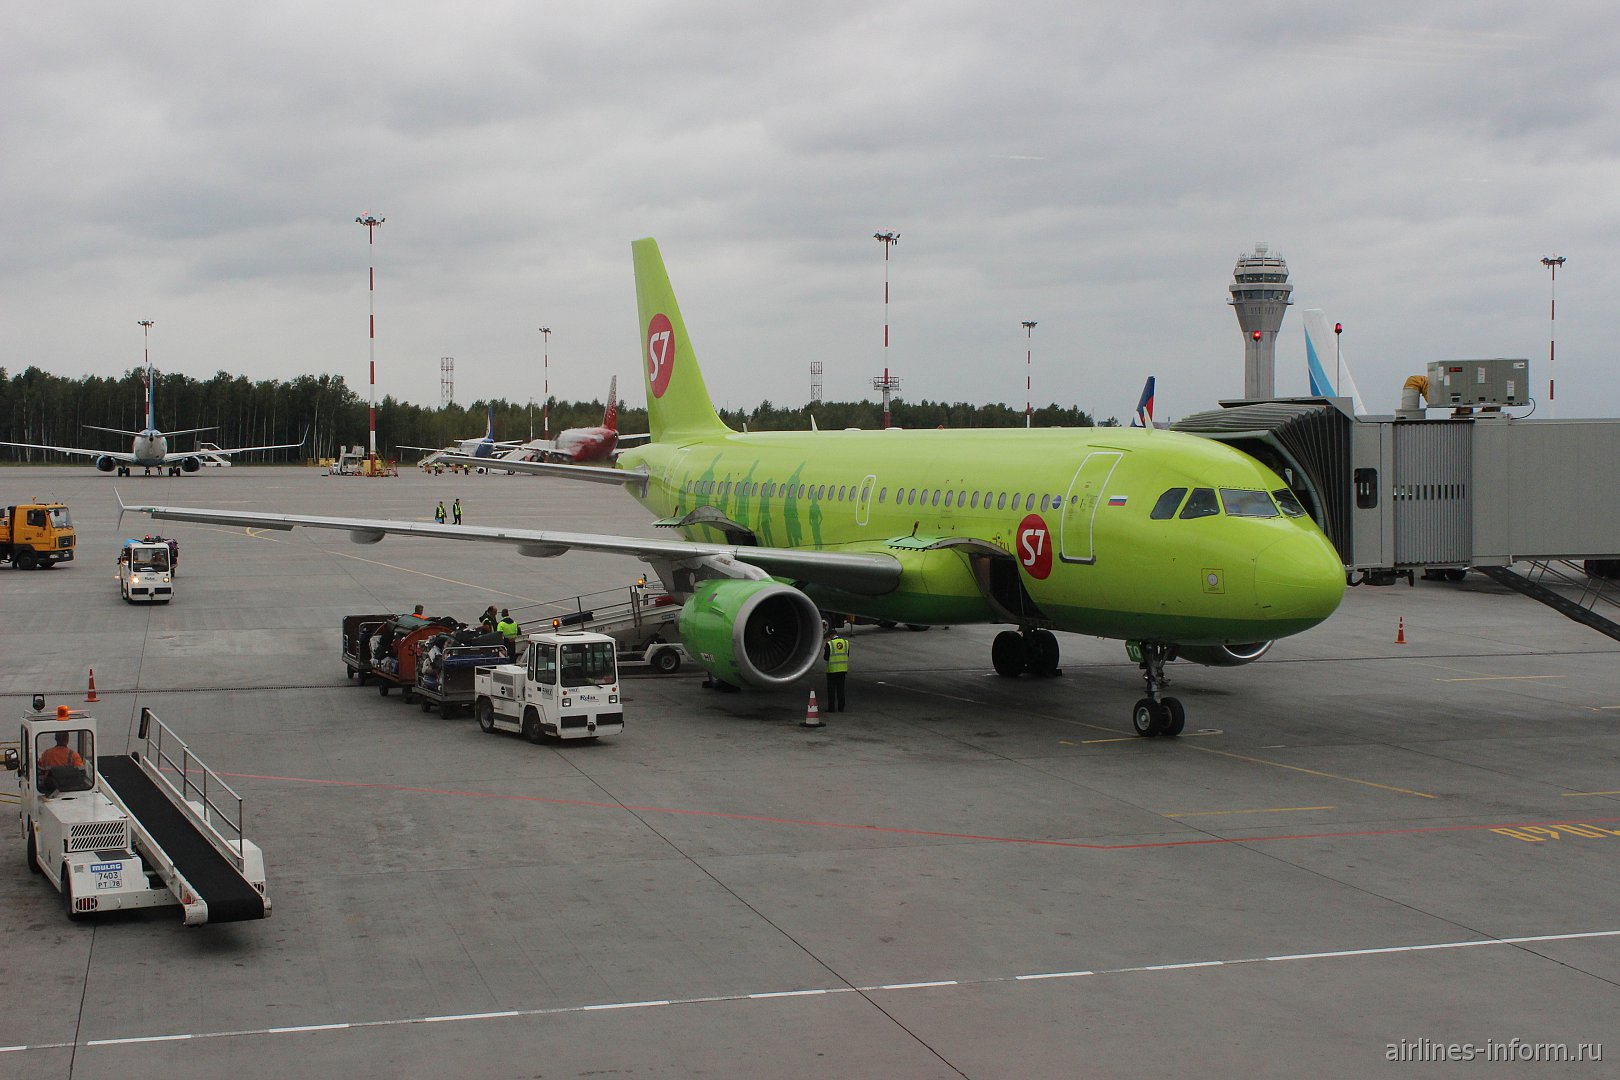 Летний отпуск. Часть 7 - Санкт-Петербург (Пулково 1 - LED) - Москва (Домодедово - DME) с S7 Airlines на А-319